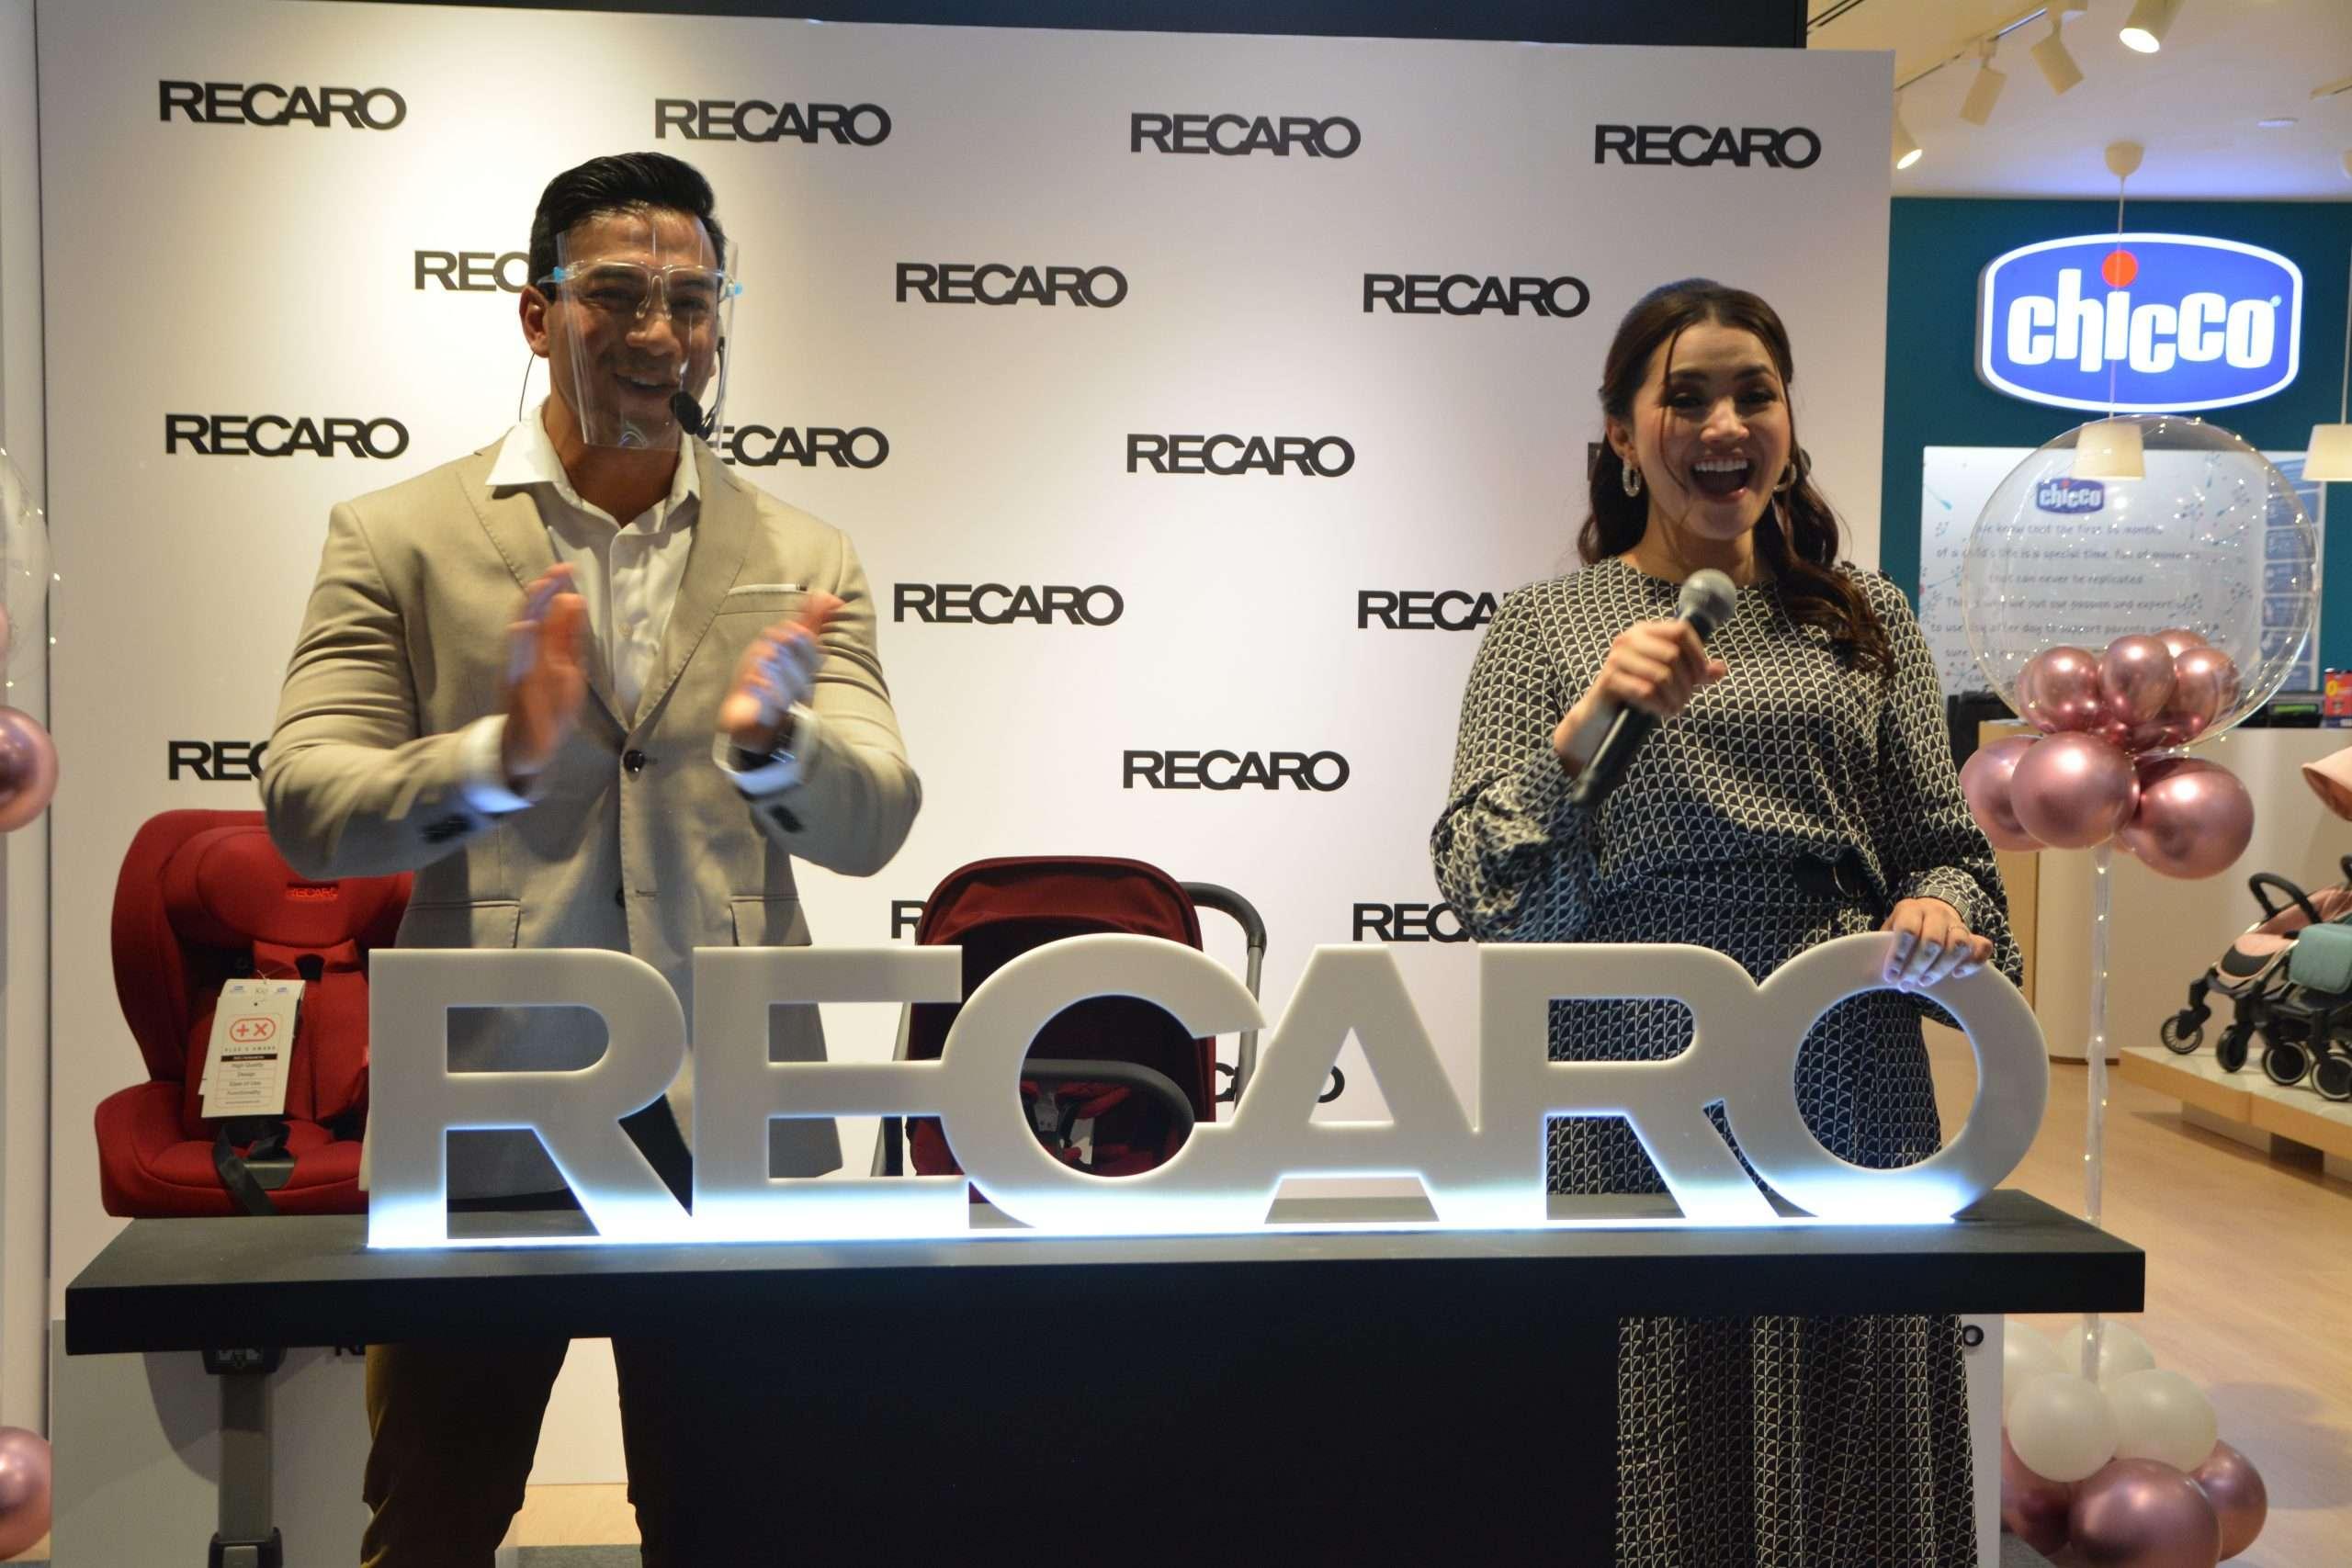 Recaro Product Launching